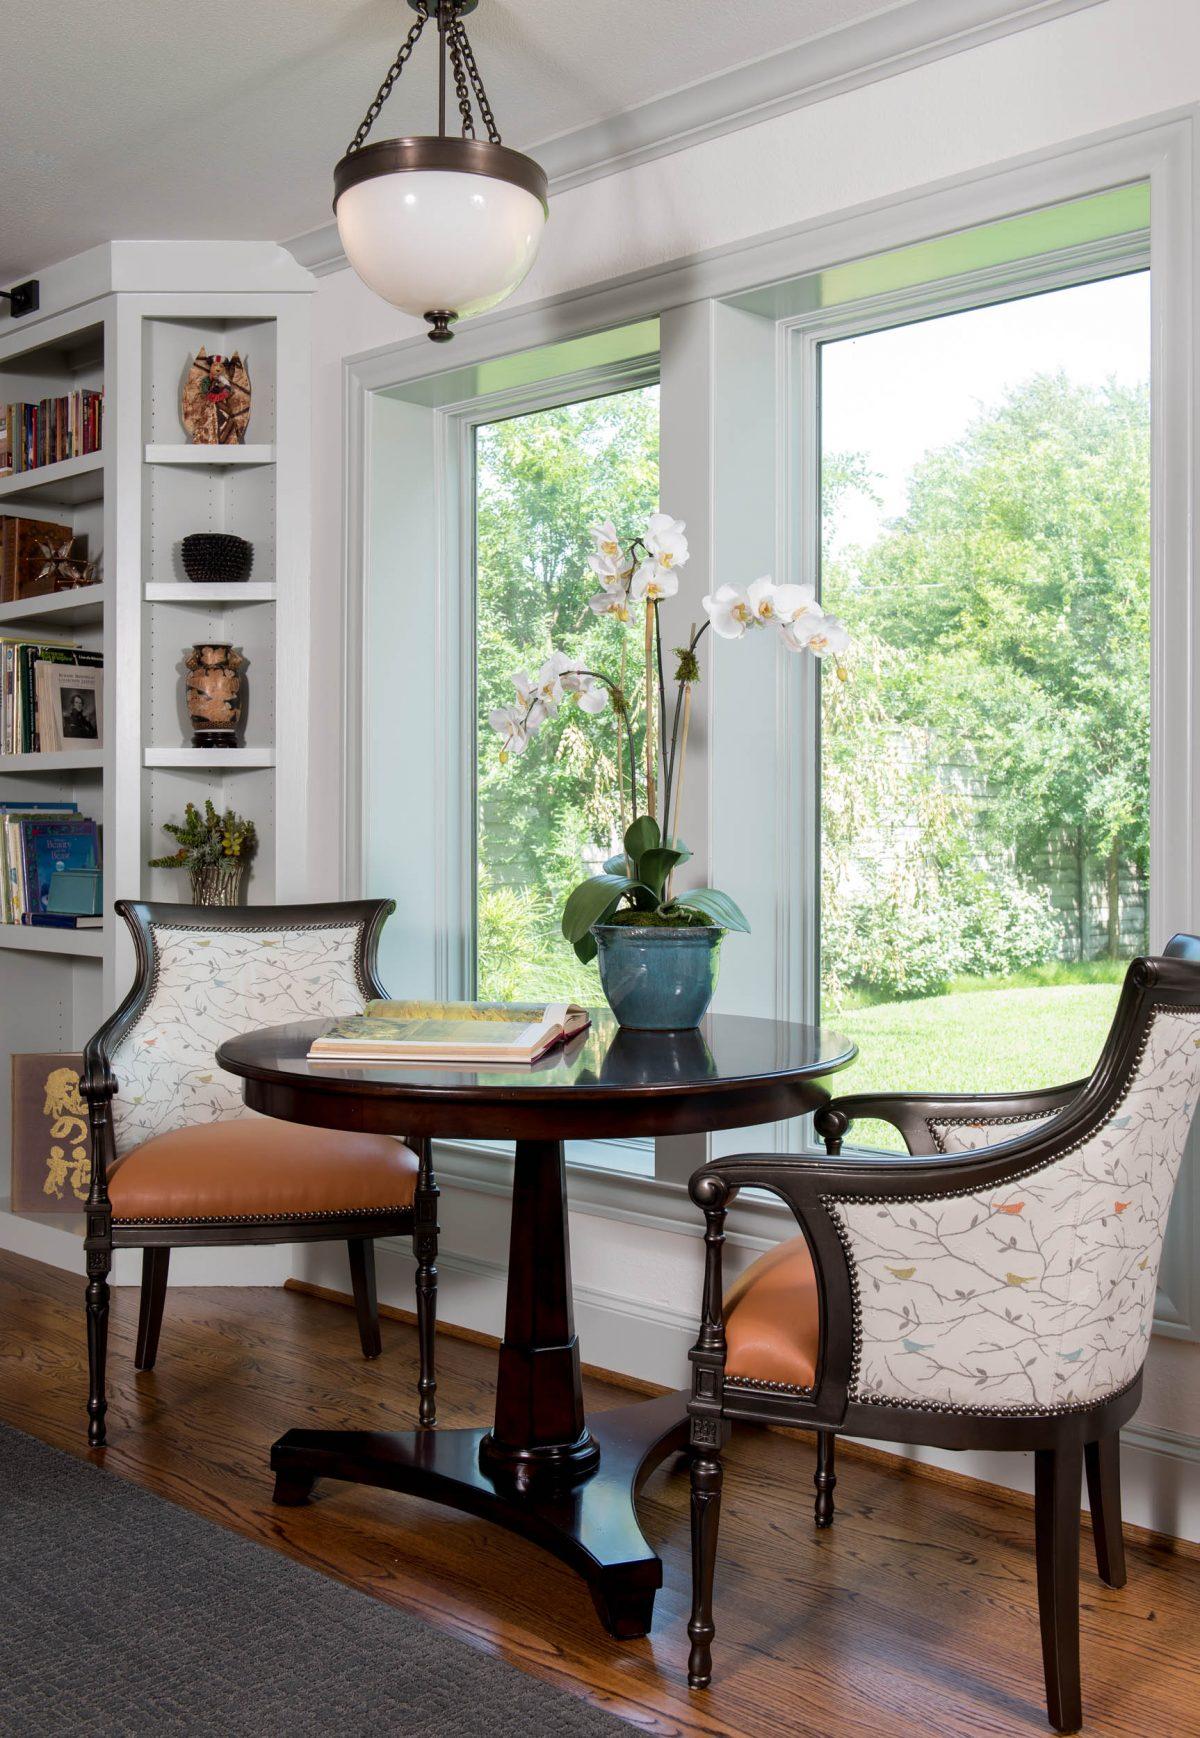 Preston Hollow Interior Designer